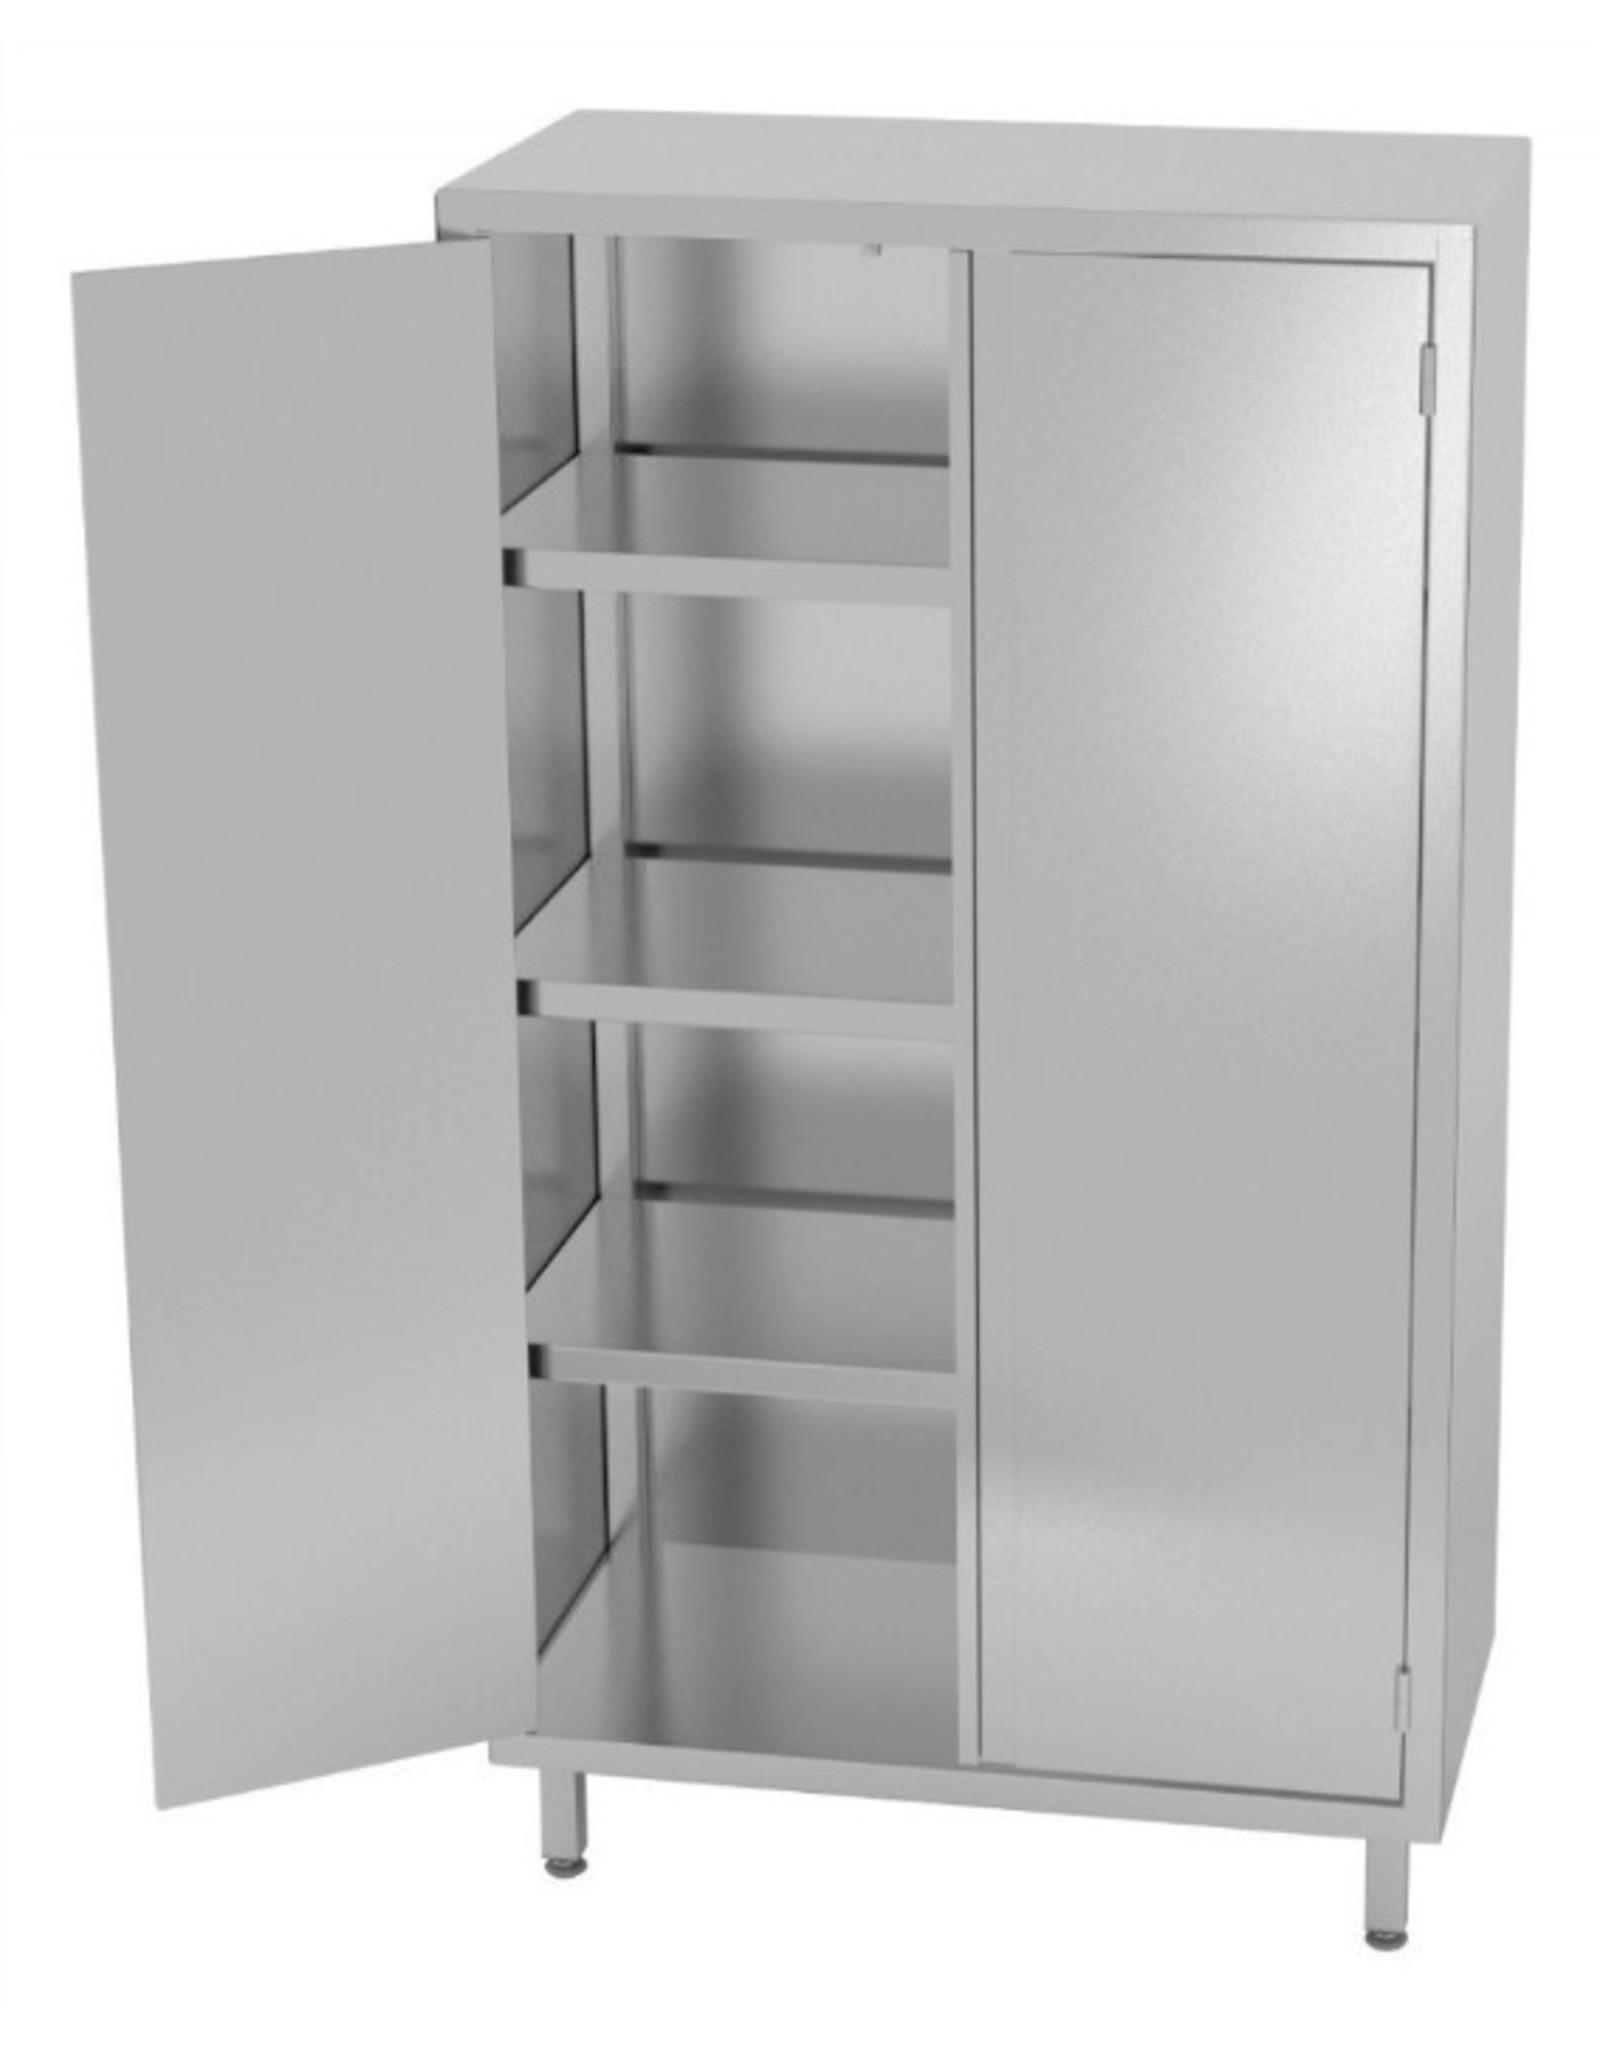 Kast met dubbele klapdeuren | 700-1200mm breed | 500-700mm diep | 2000mm hoog